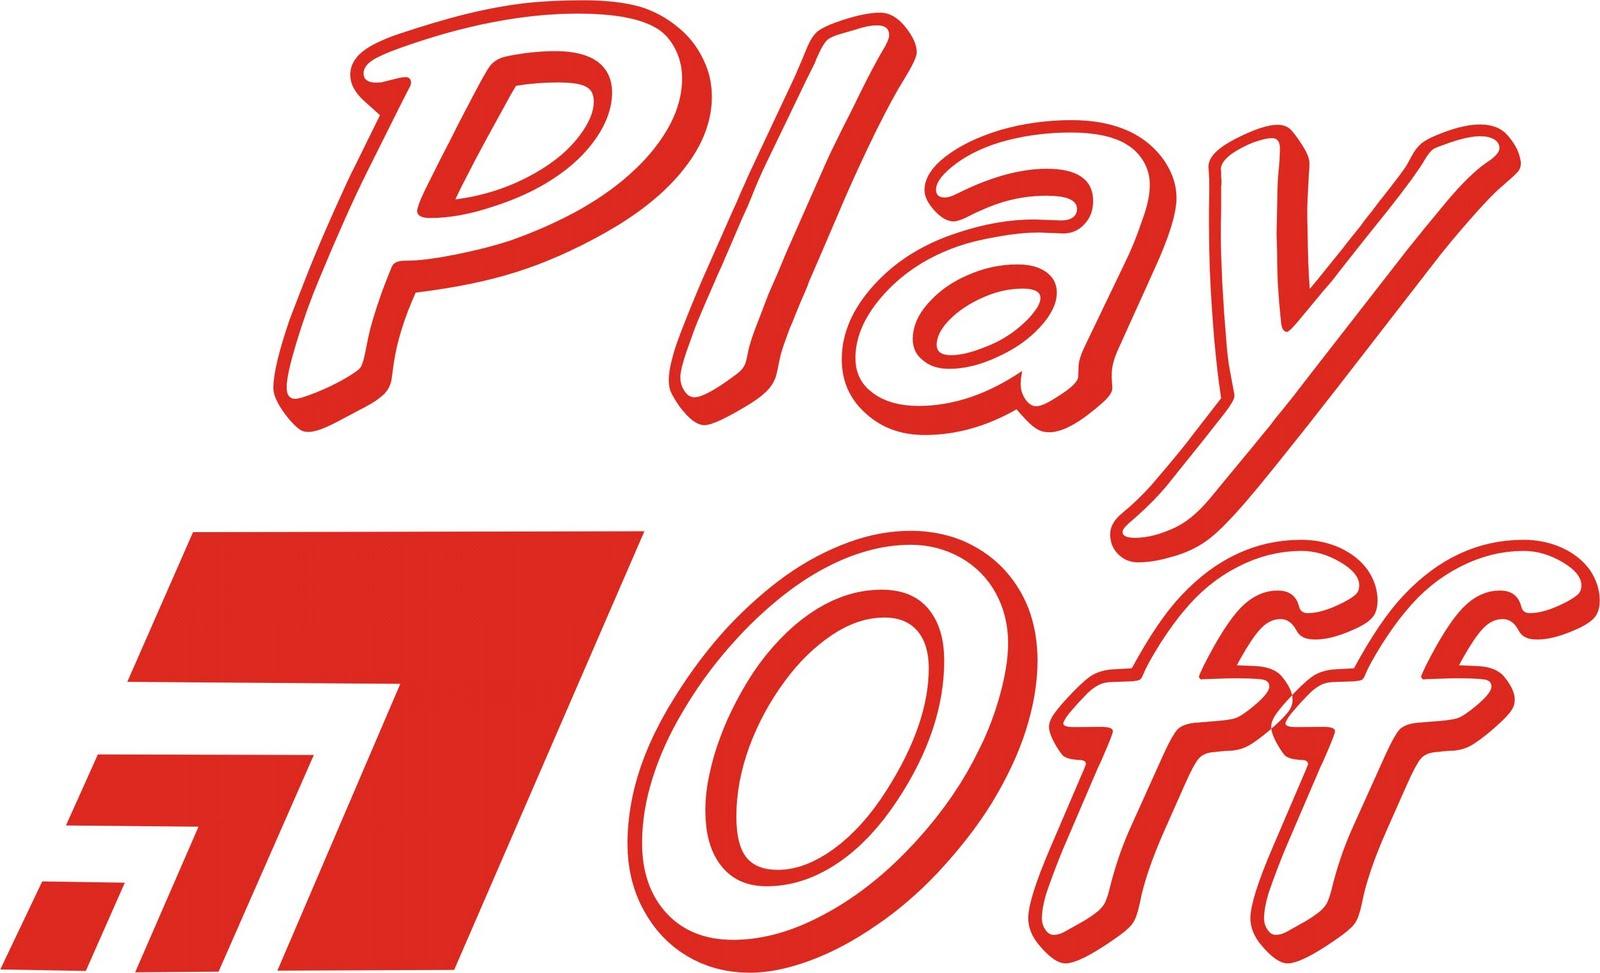 http://4.bp.blogspot.com/_dtA2nHi4eSc/S8WRKpOuVoI/AAAAAAAAAHM/R_vGRJ0qx7I/s1600/playoff.jpg